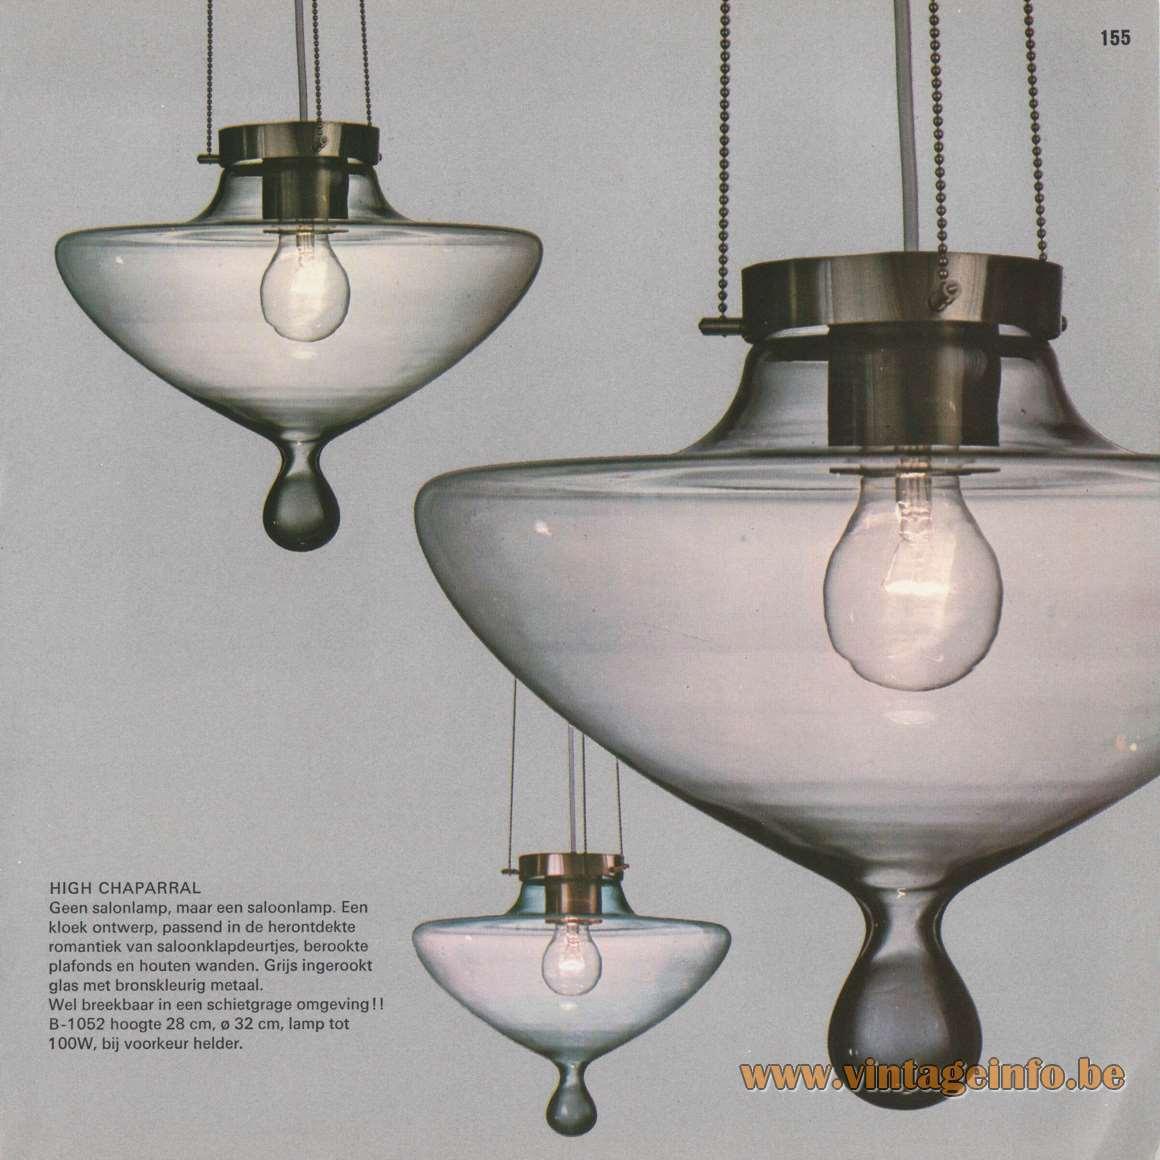 Raak Catalogue 8 - 1968 - High Chaparral Droplet Pendant Lamps